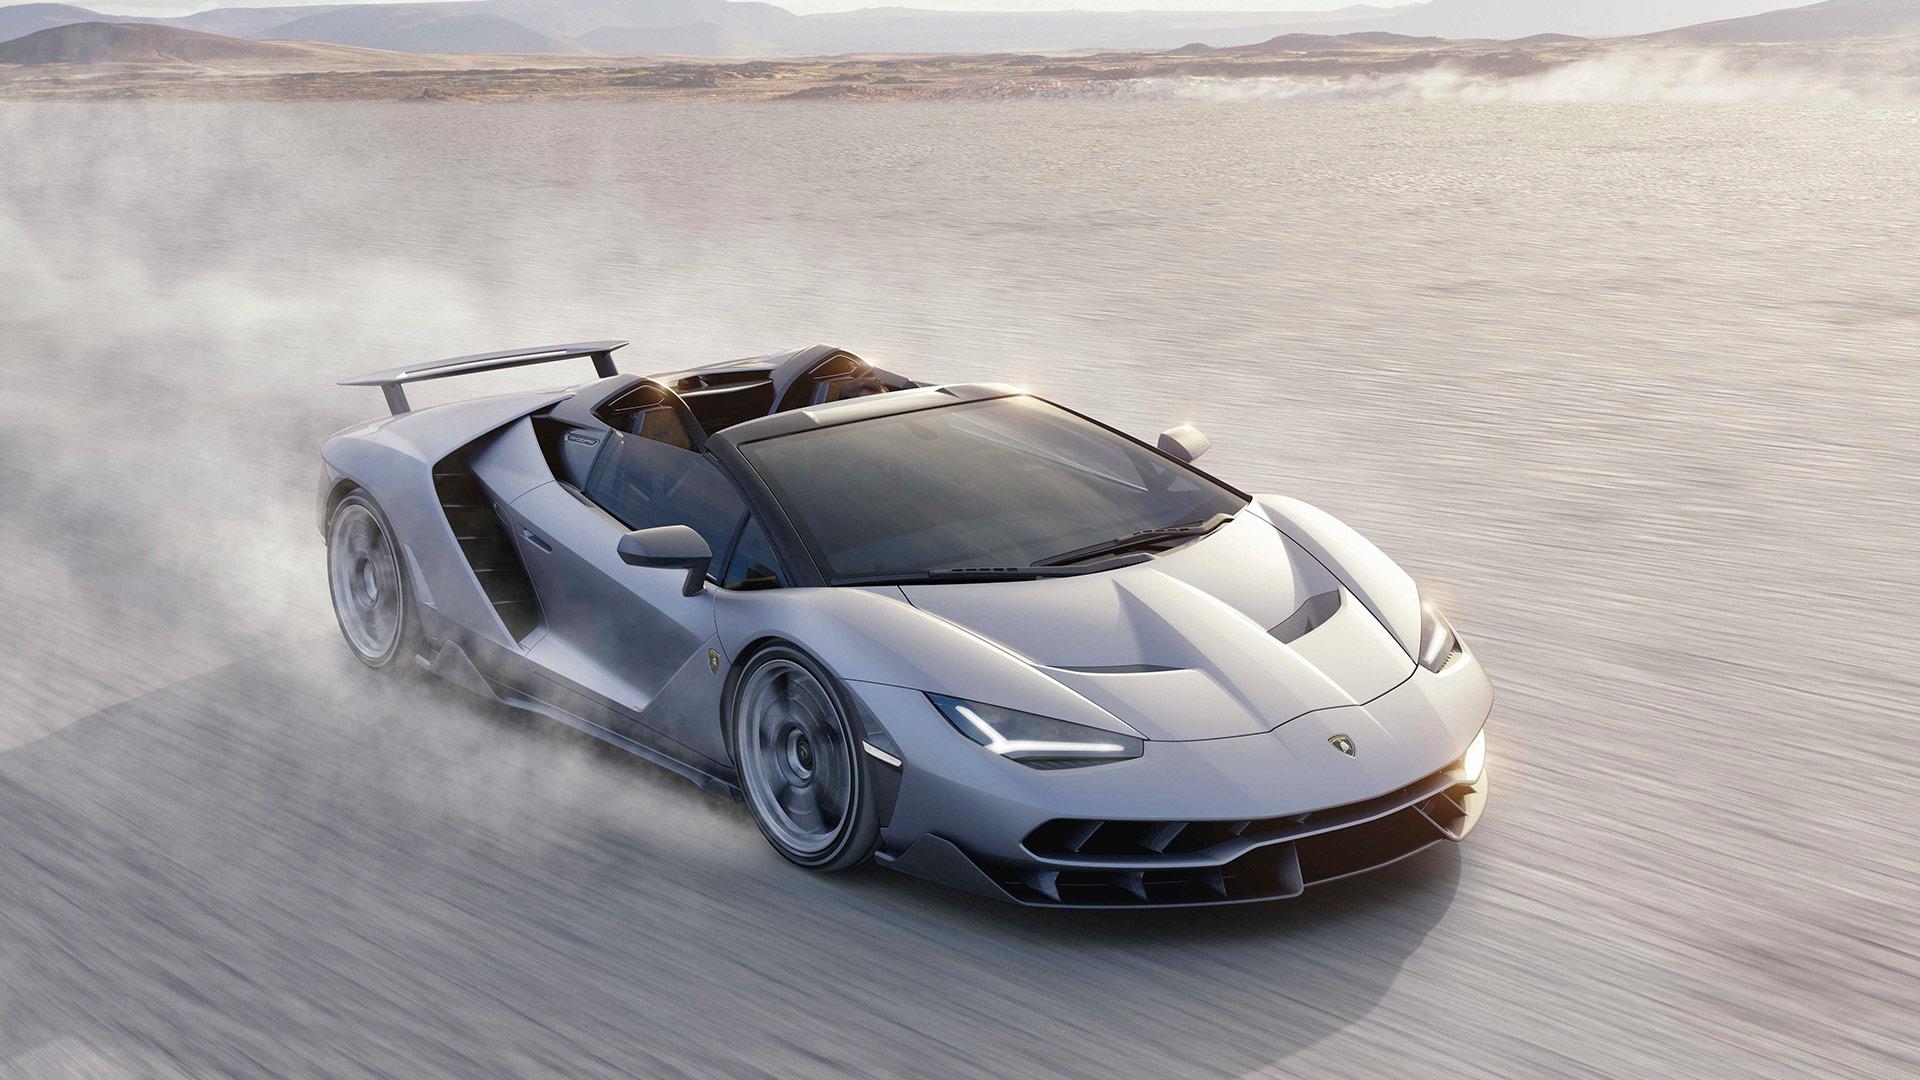 2017 Lamborghini Centenario Roadster Hd Wallpaper Background Image